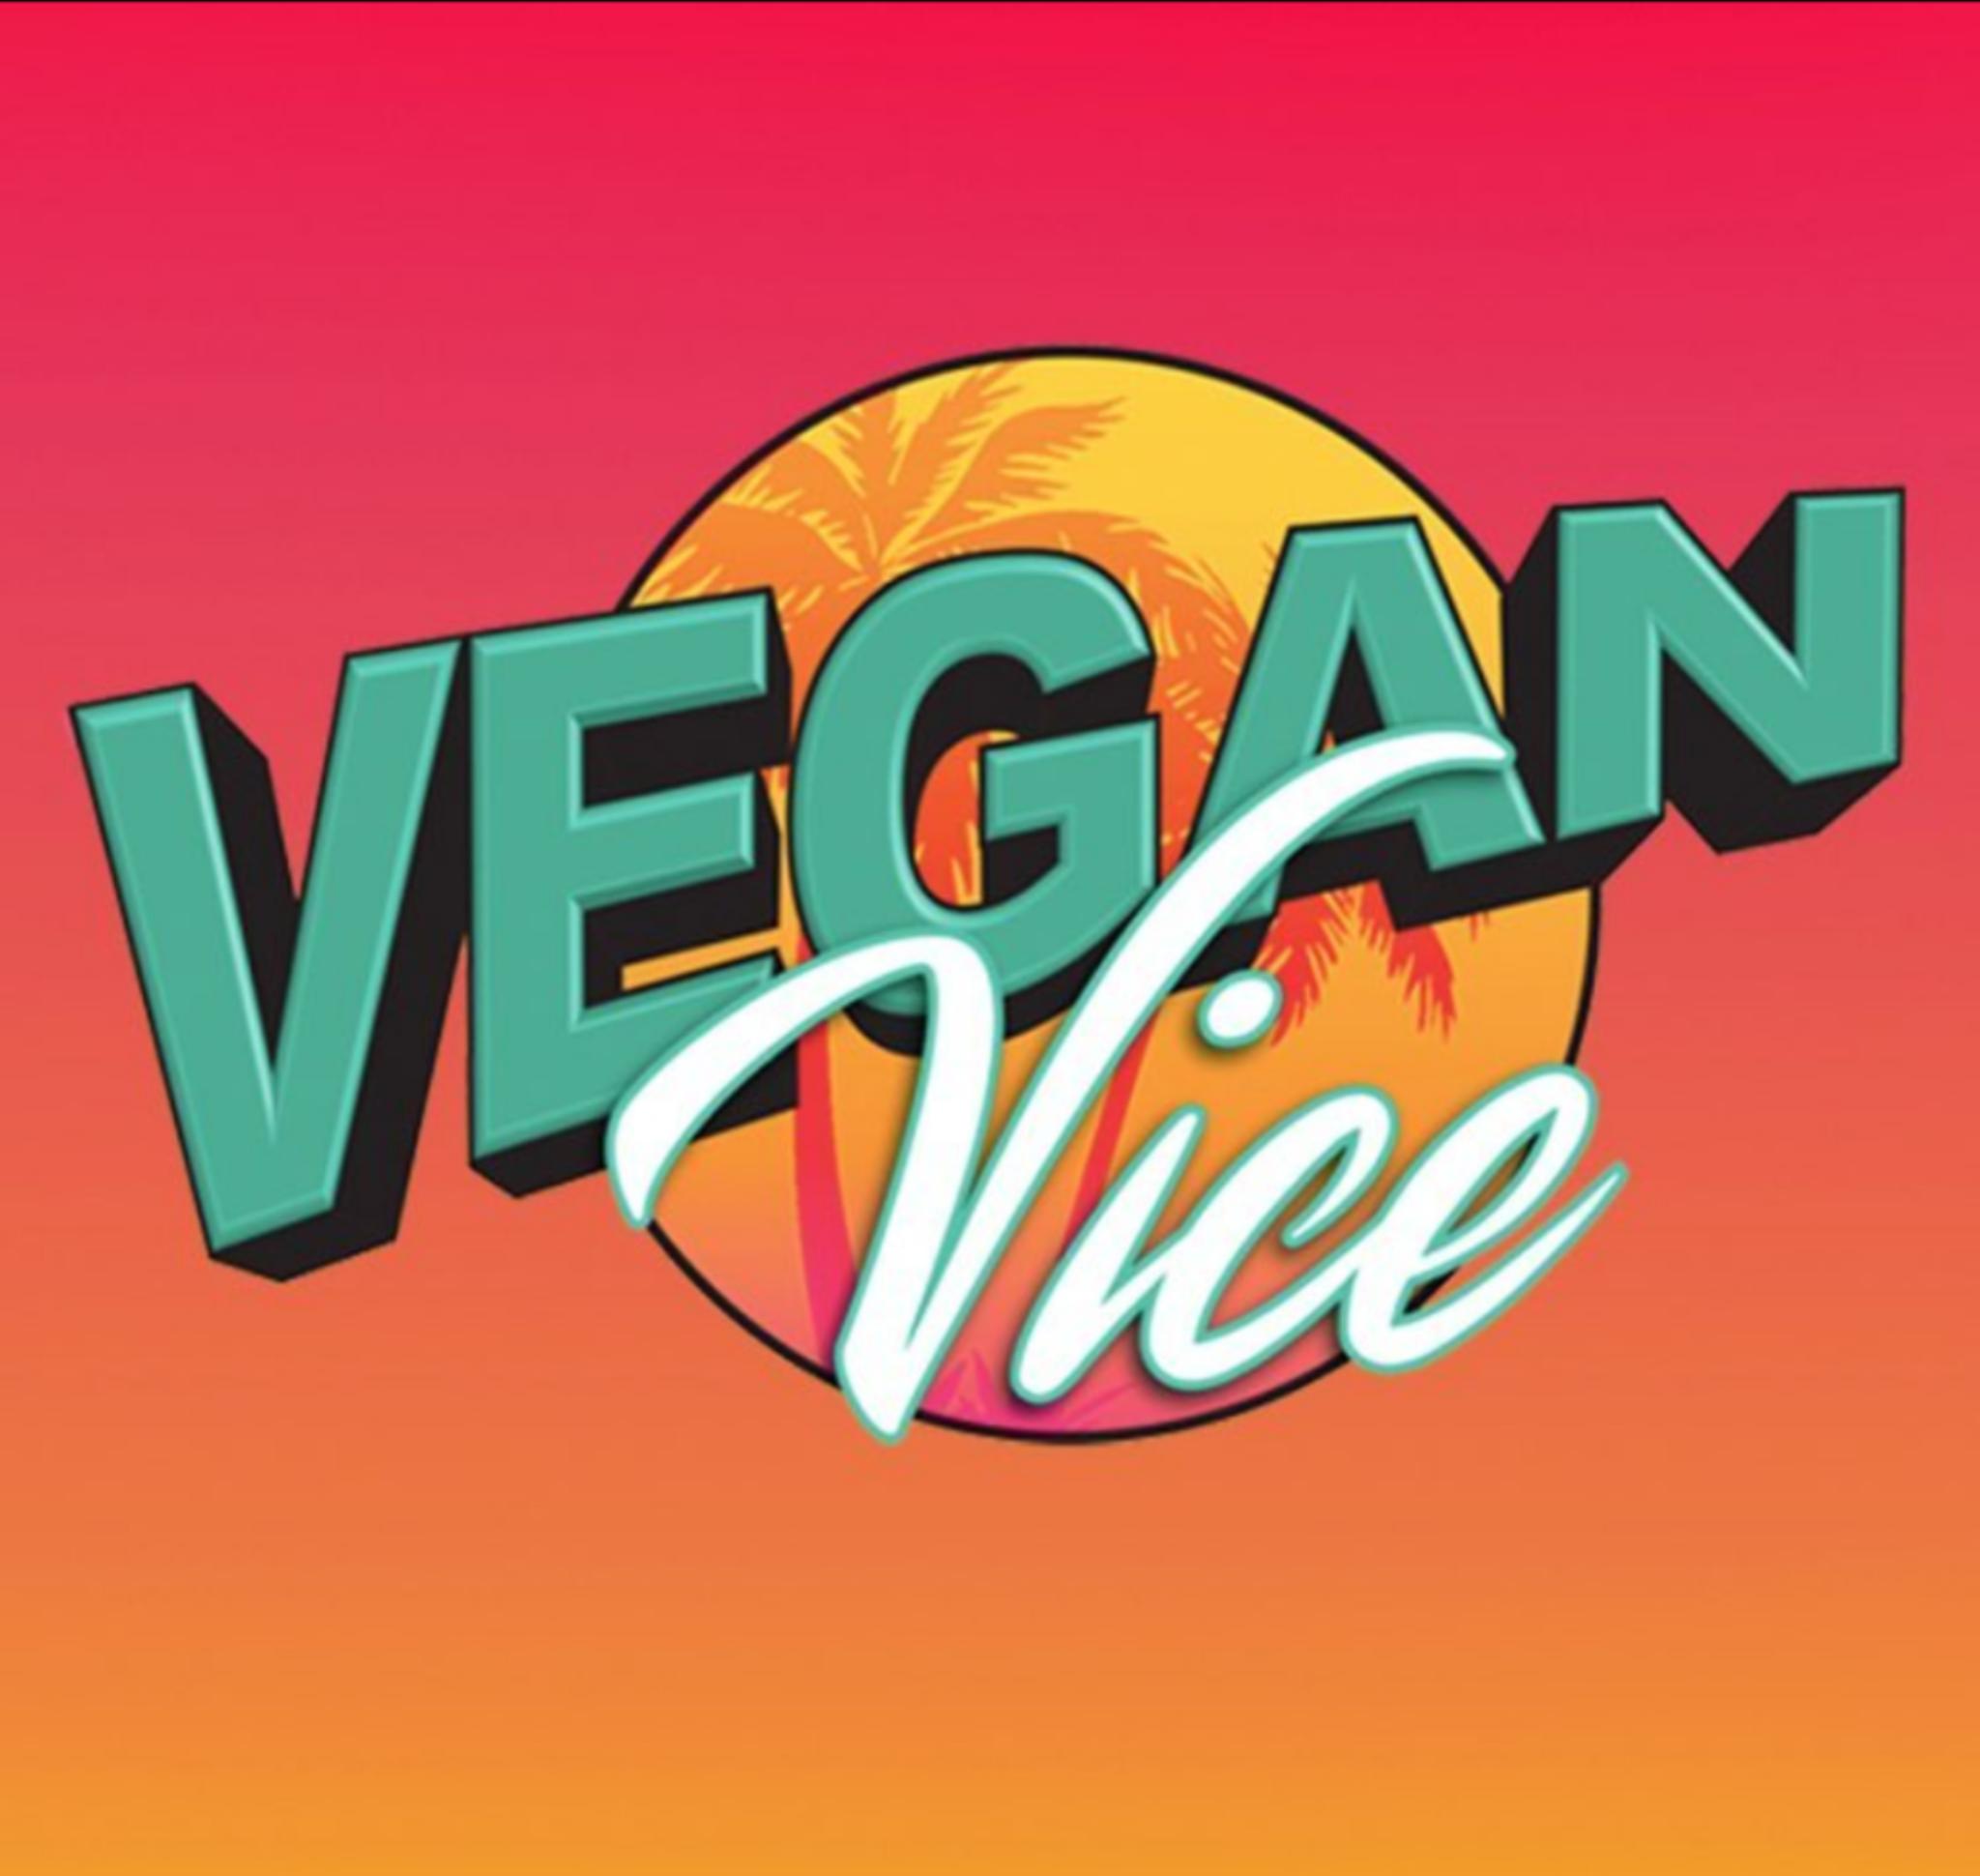 Vegan Vice Club ltd